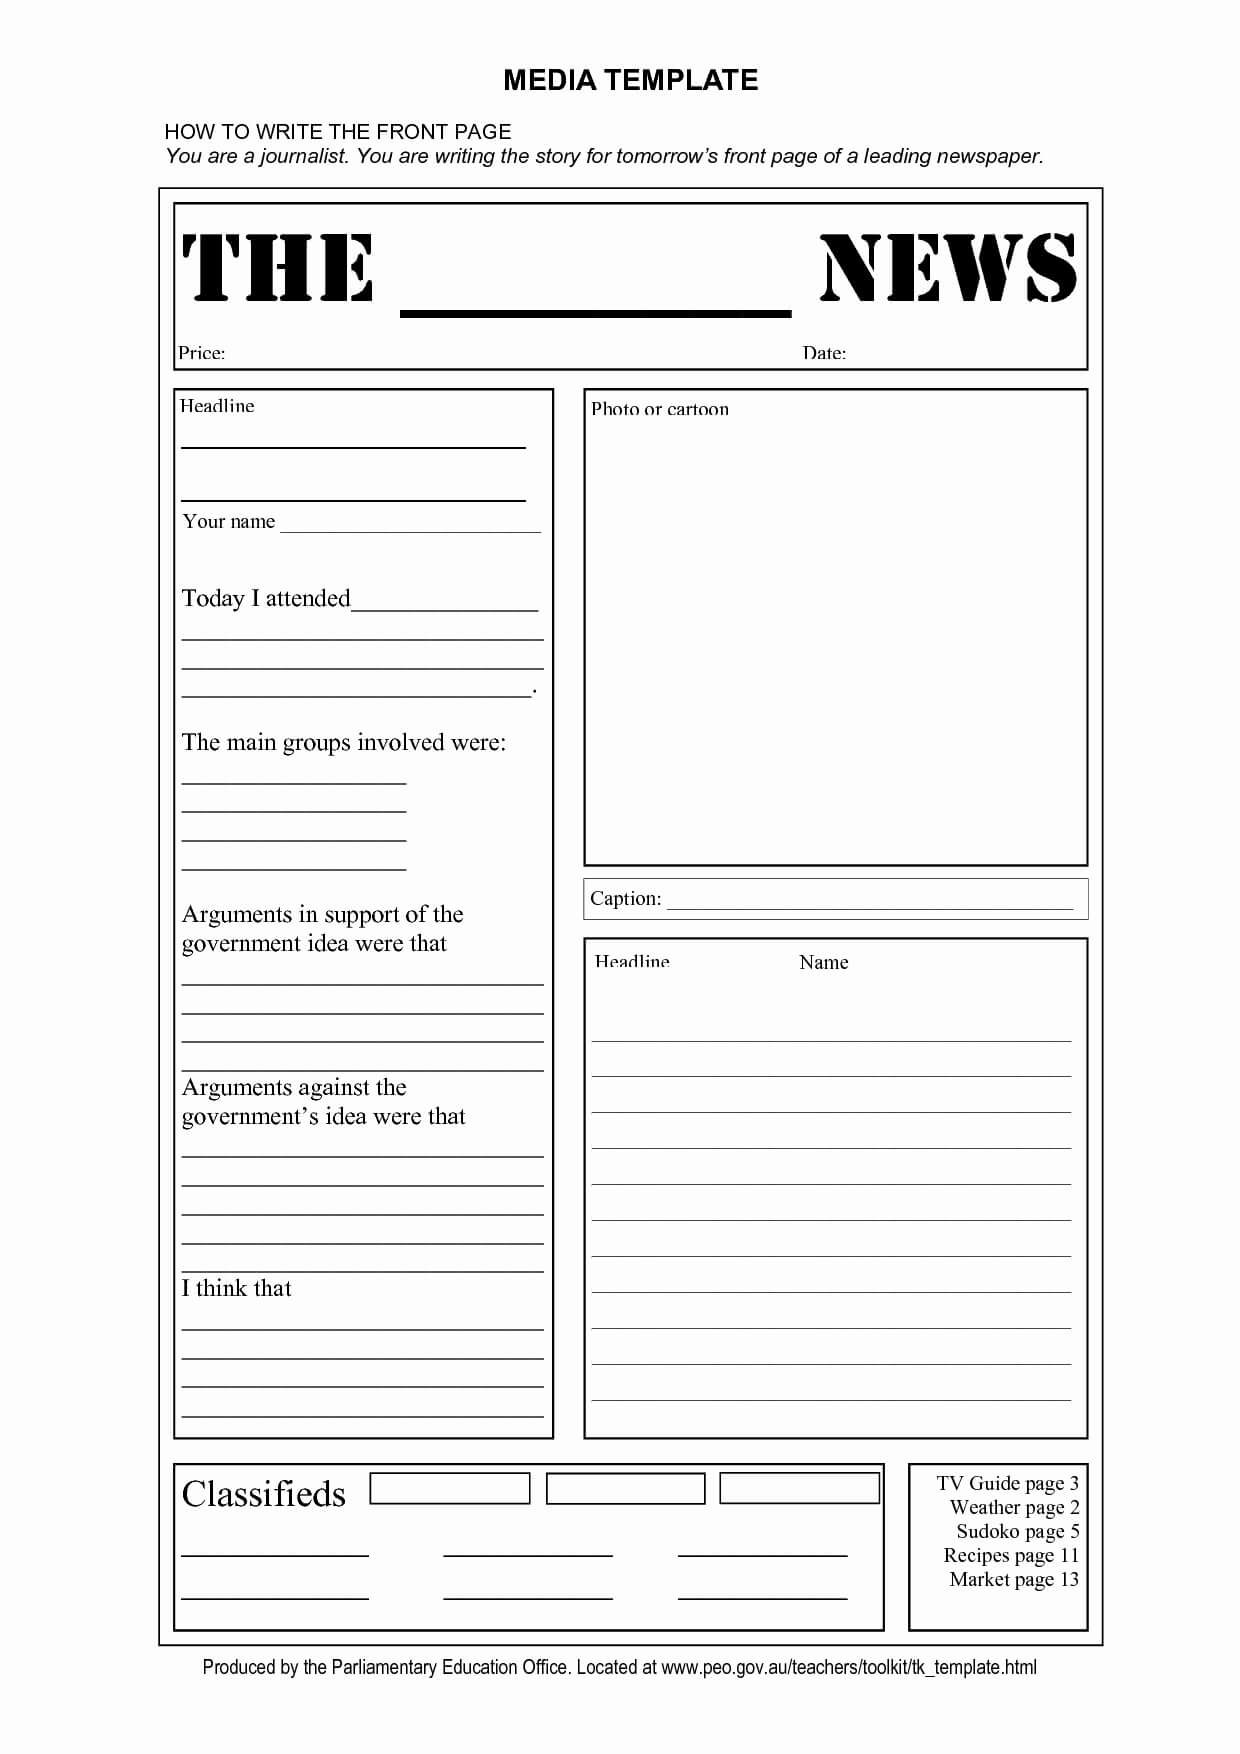 036 Newspaper Template Microsoft Word Blank Rare 2016 Ideas Regarding Blank Newspaper Template For Word